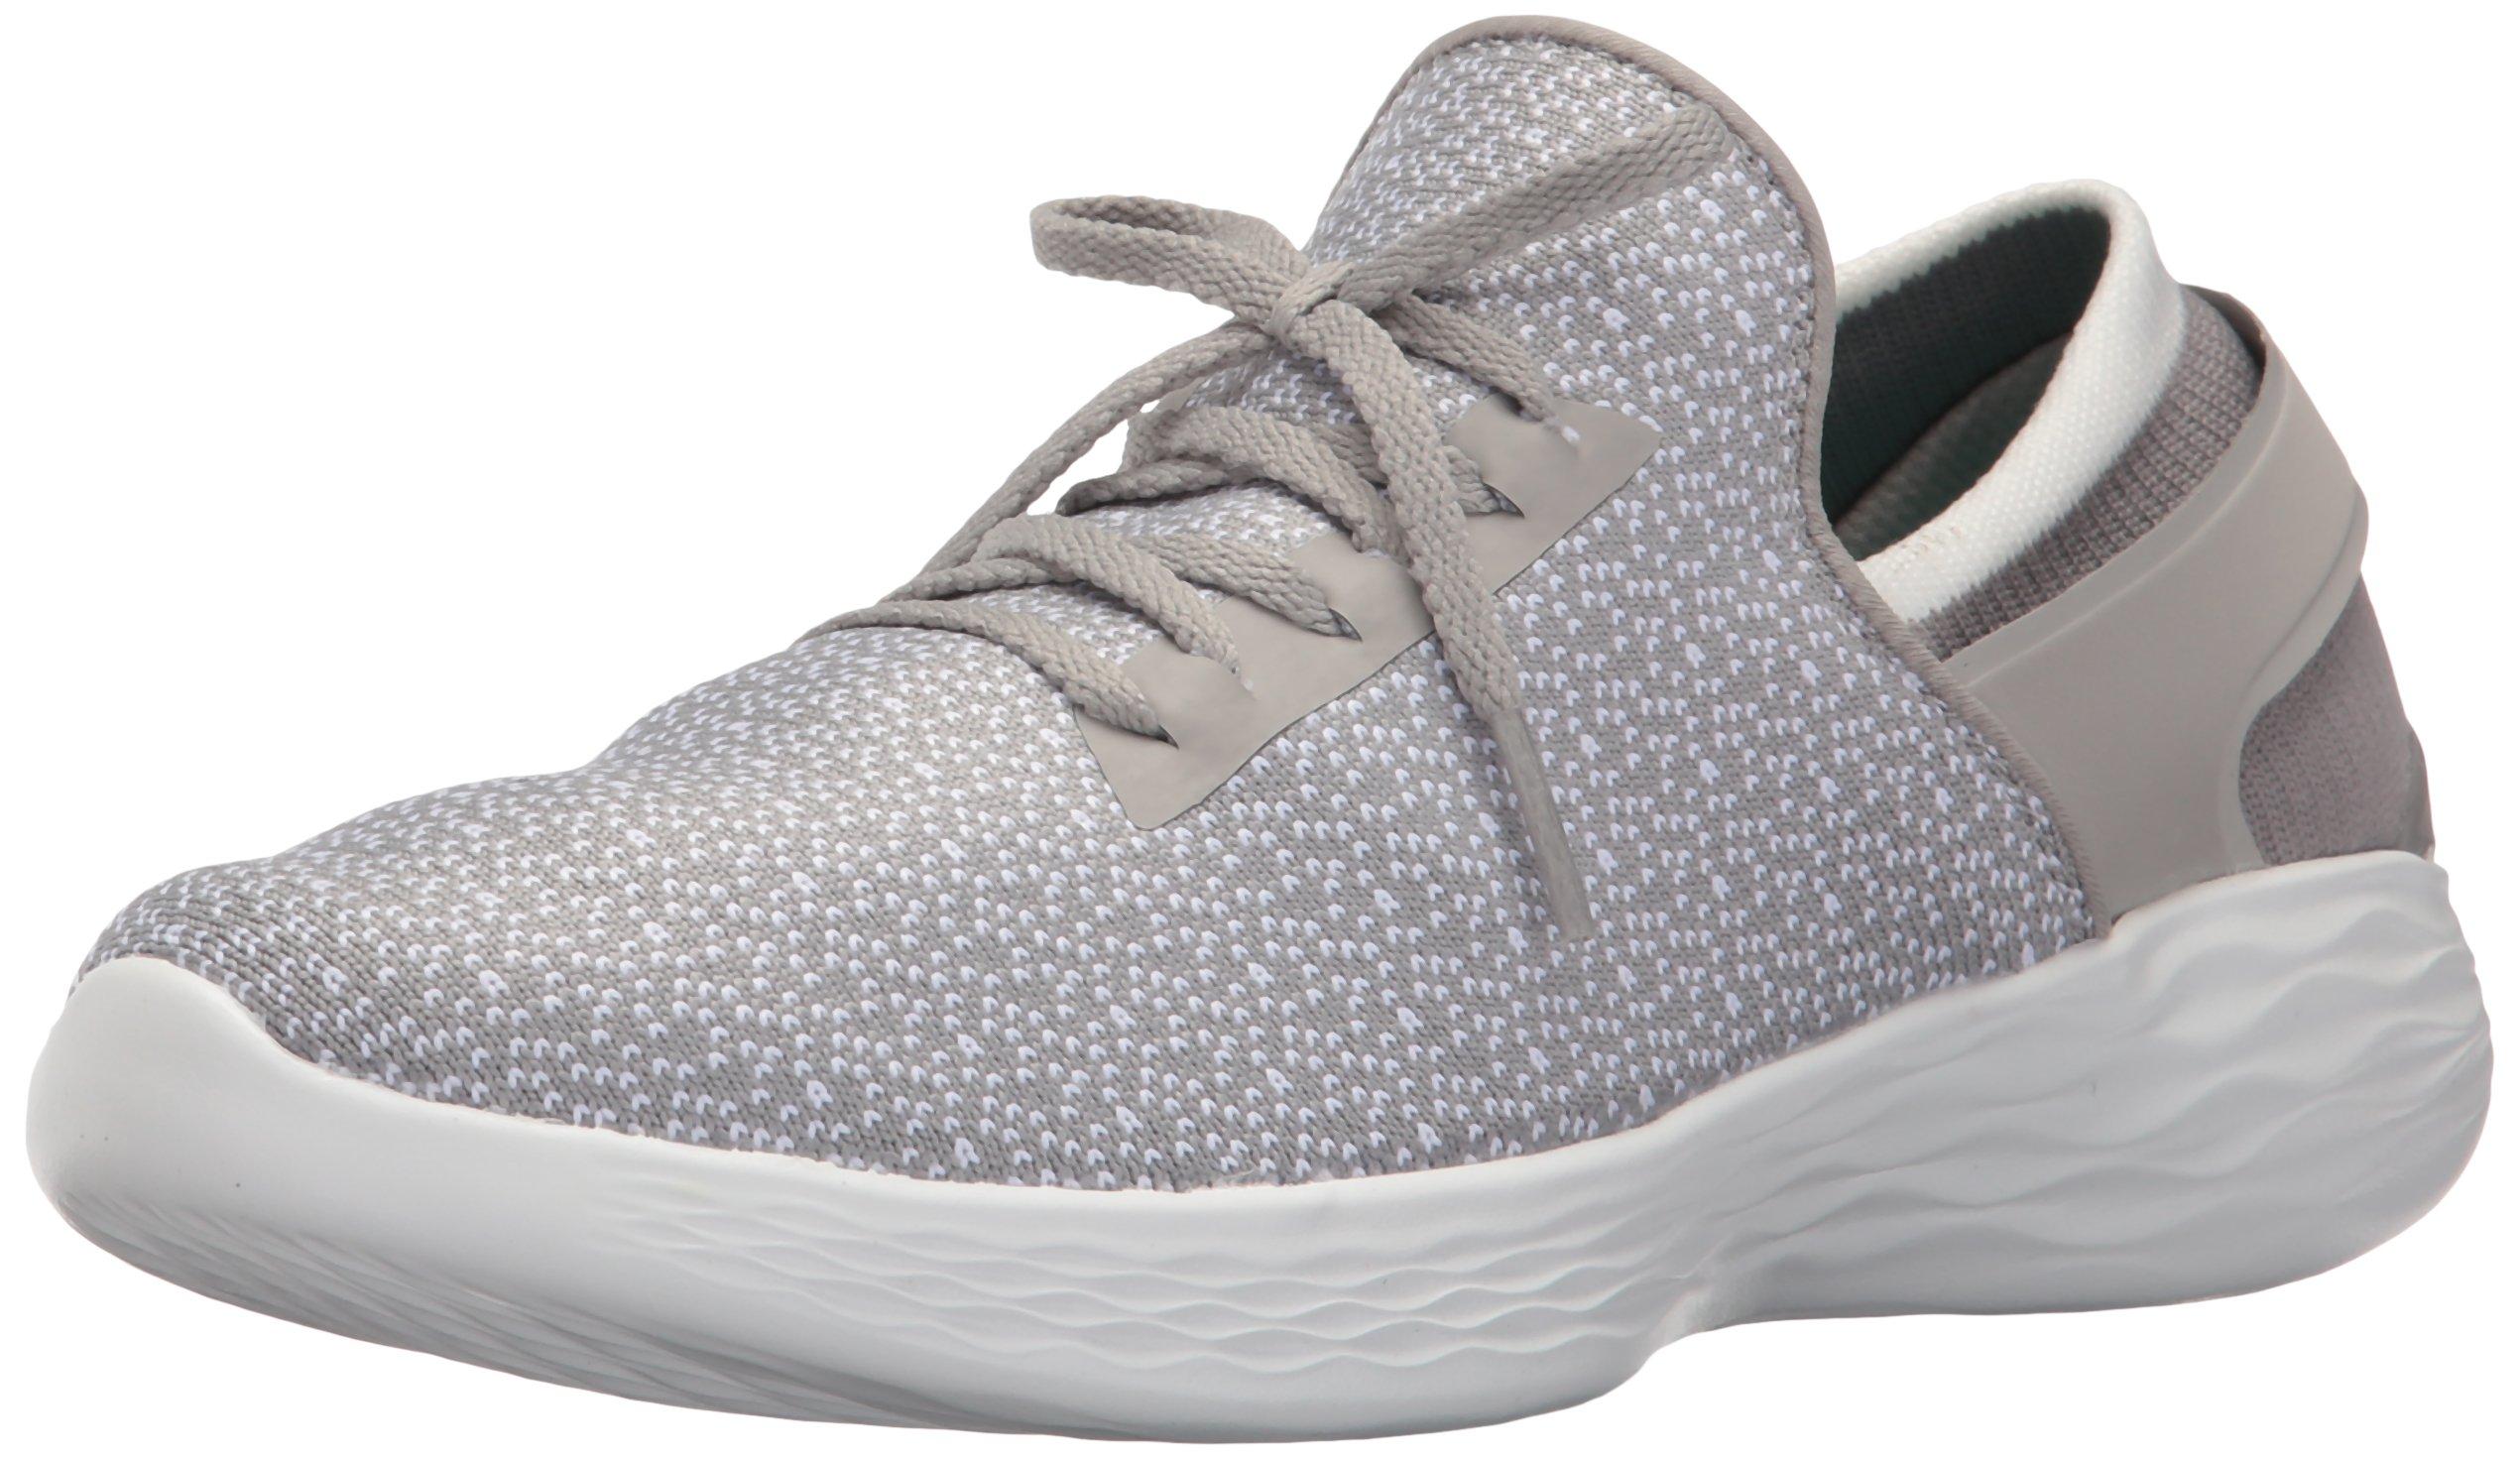 Skechers Women's You Inspire Slip-On Shoe,Gray,7.5 M US